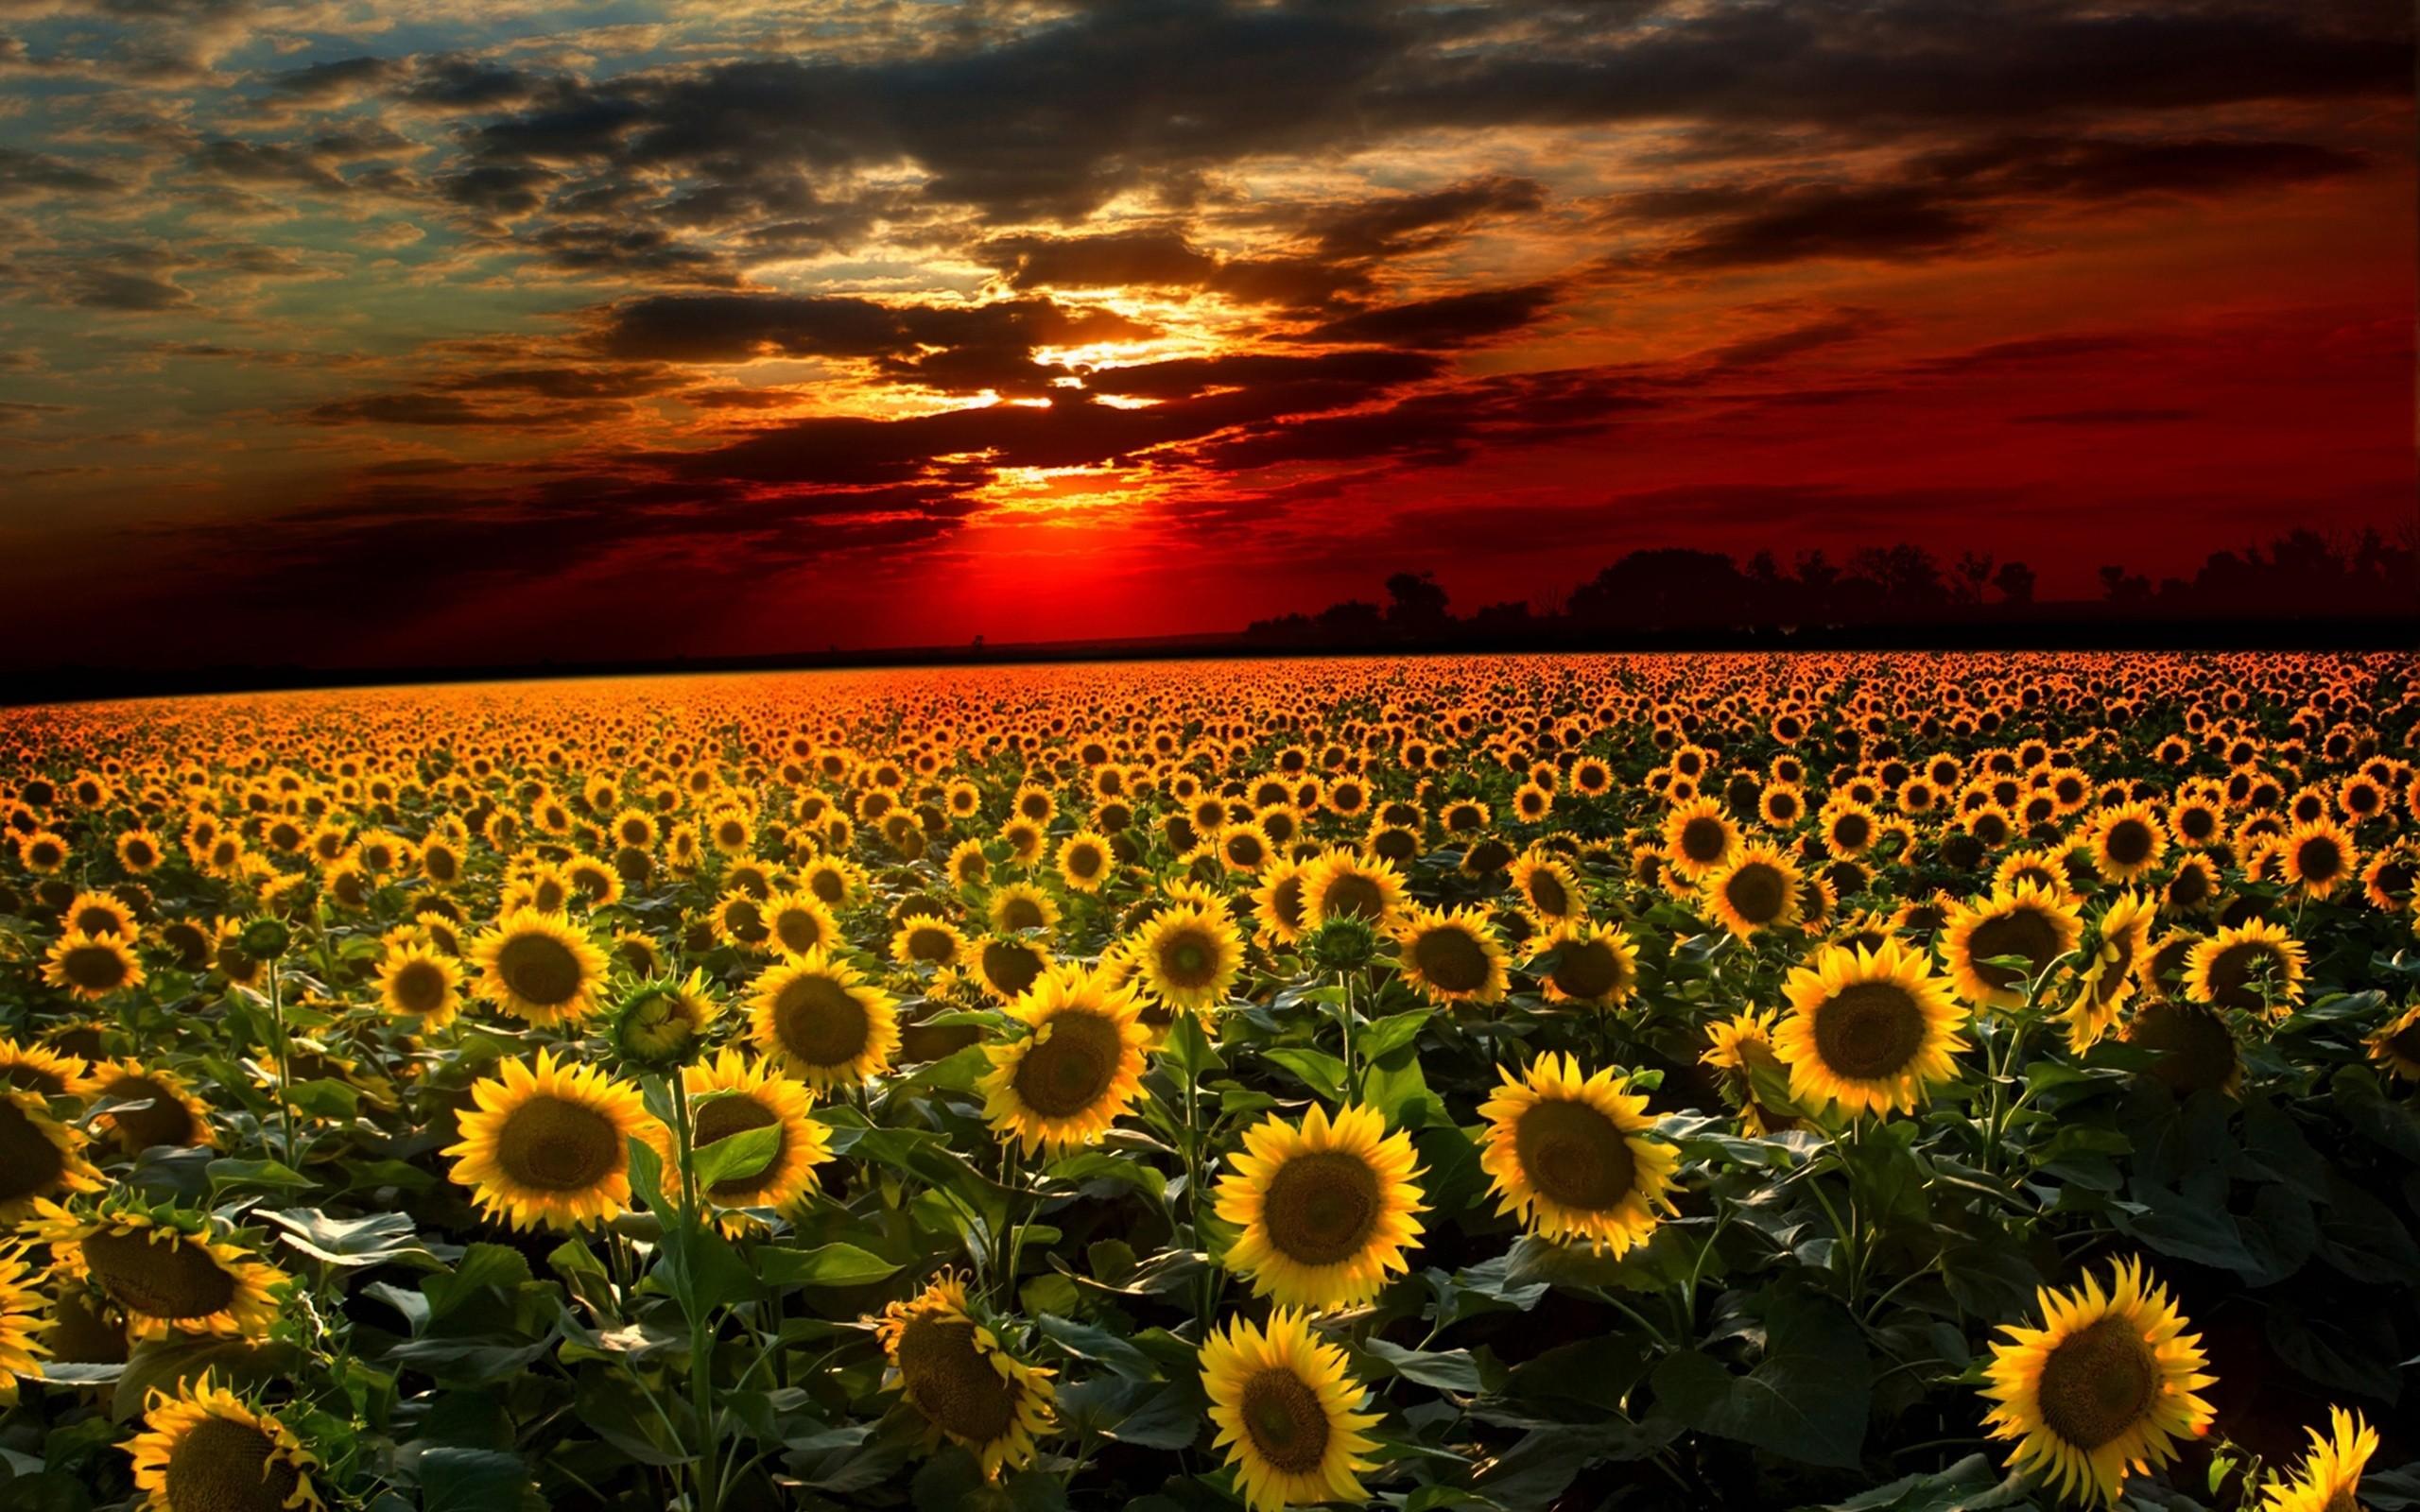 desktop backgrounds sunflowers